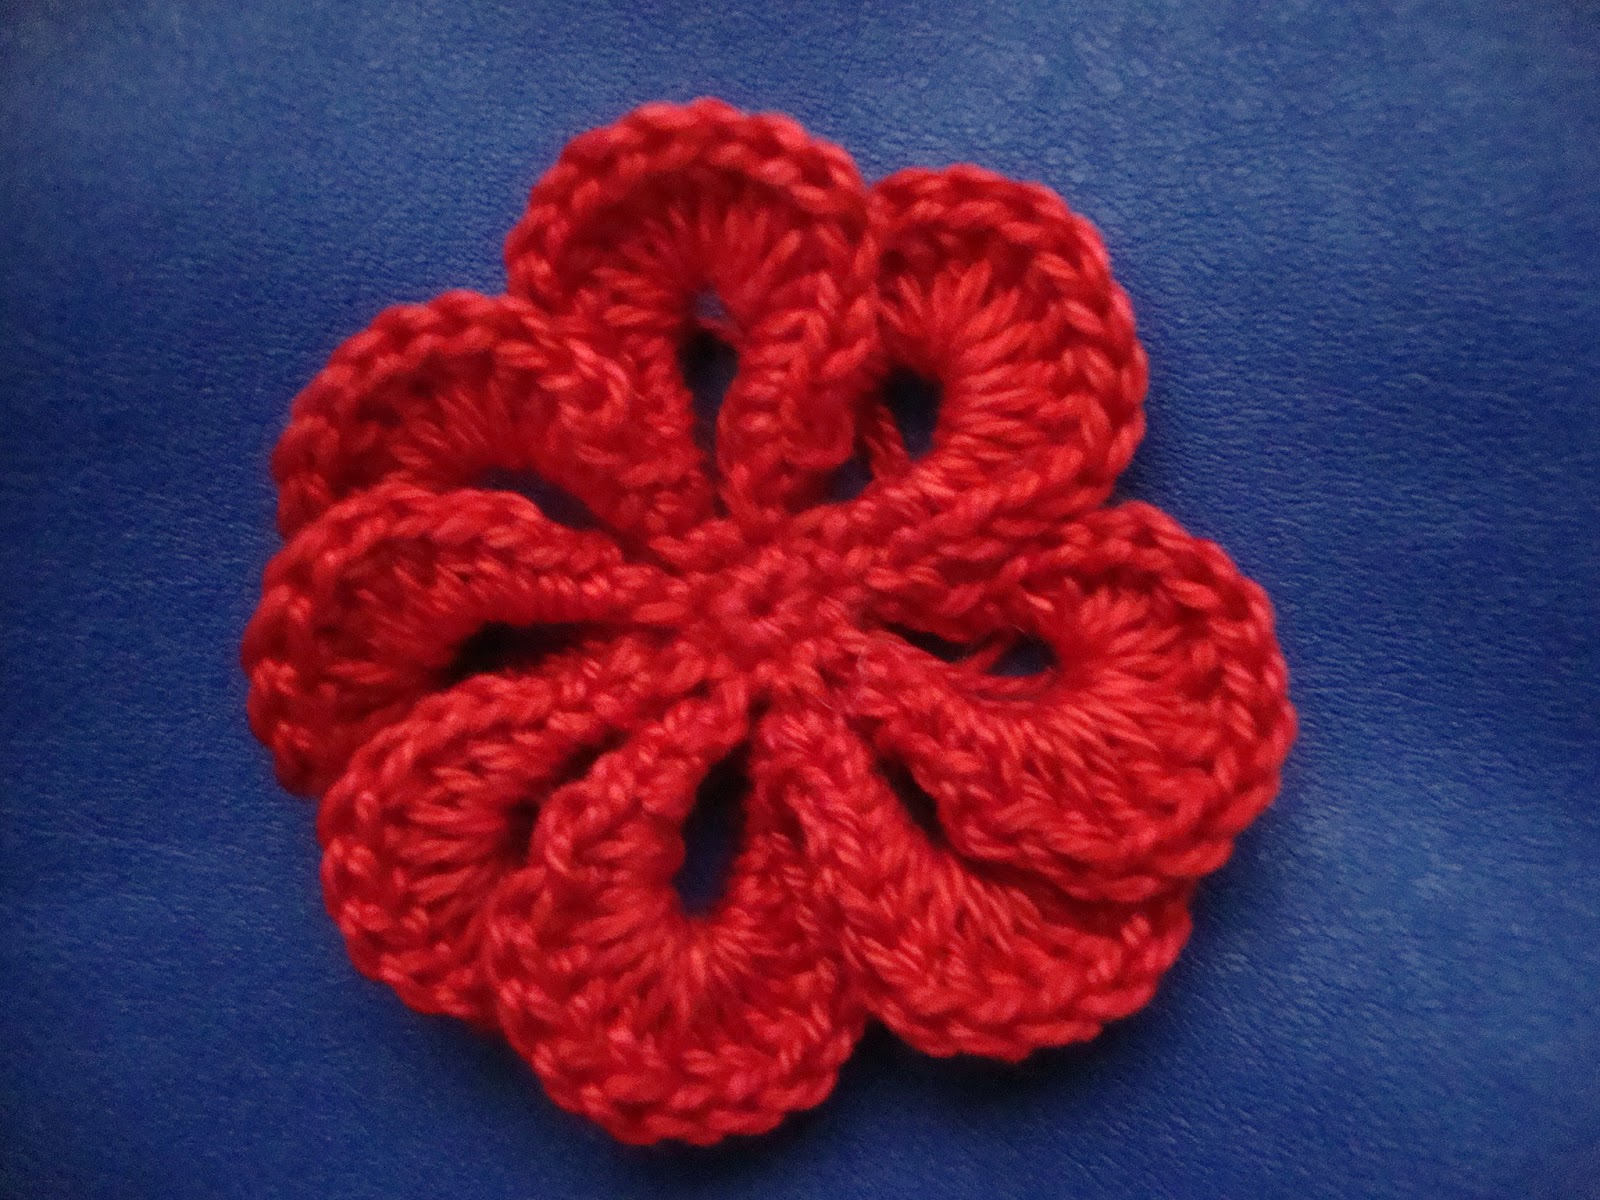 Free Crochet Flower Patterns To Print : mashababko: Wallpaper Pattern Ai